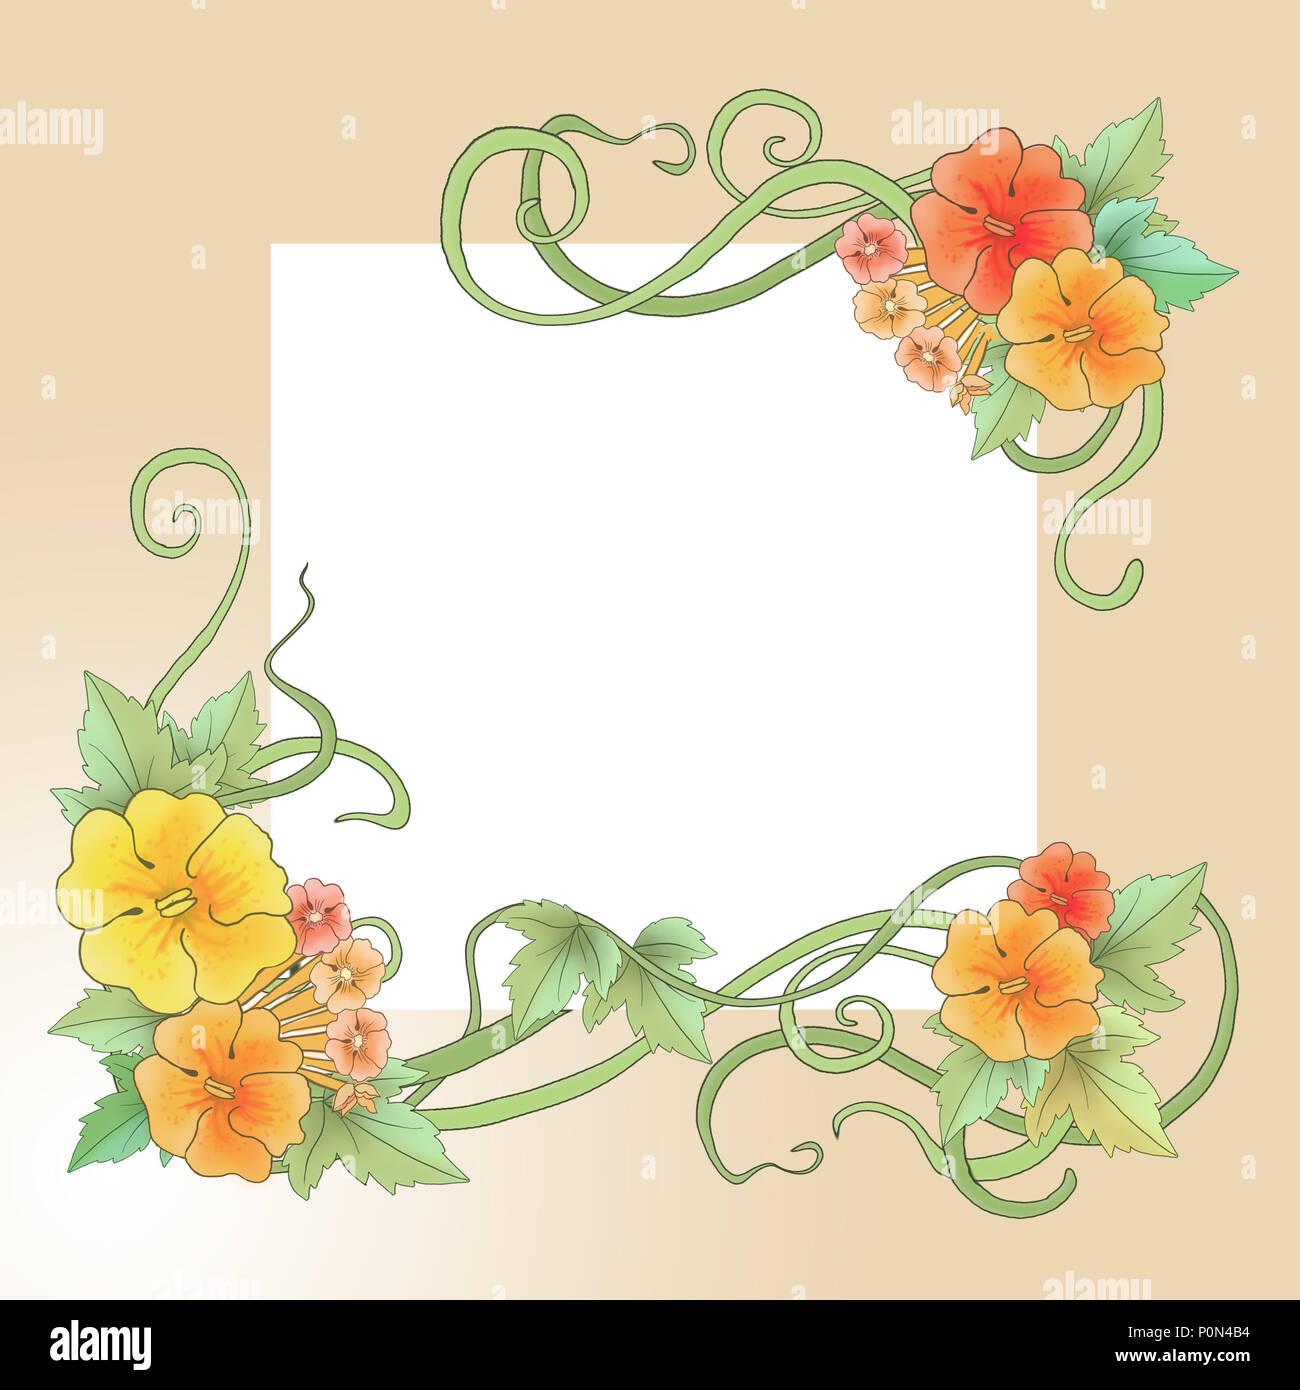 Floral ornament in Art-Nouveau style, spring motifs, illustrations ...